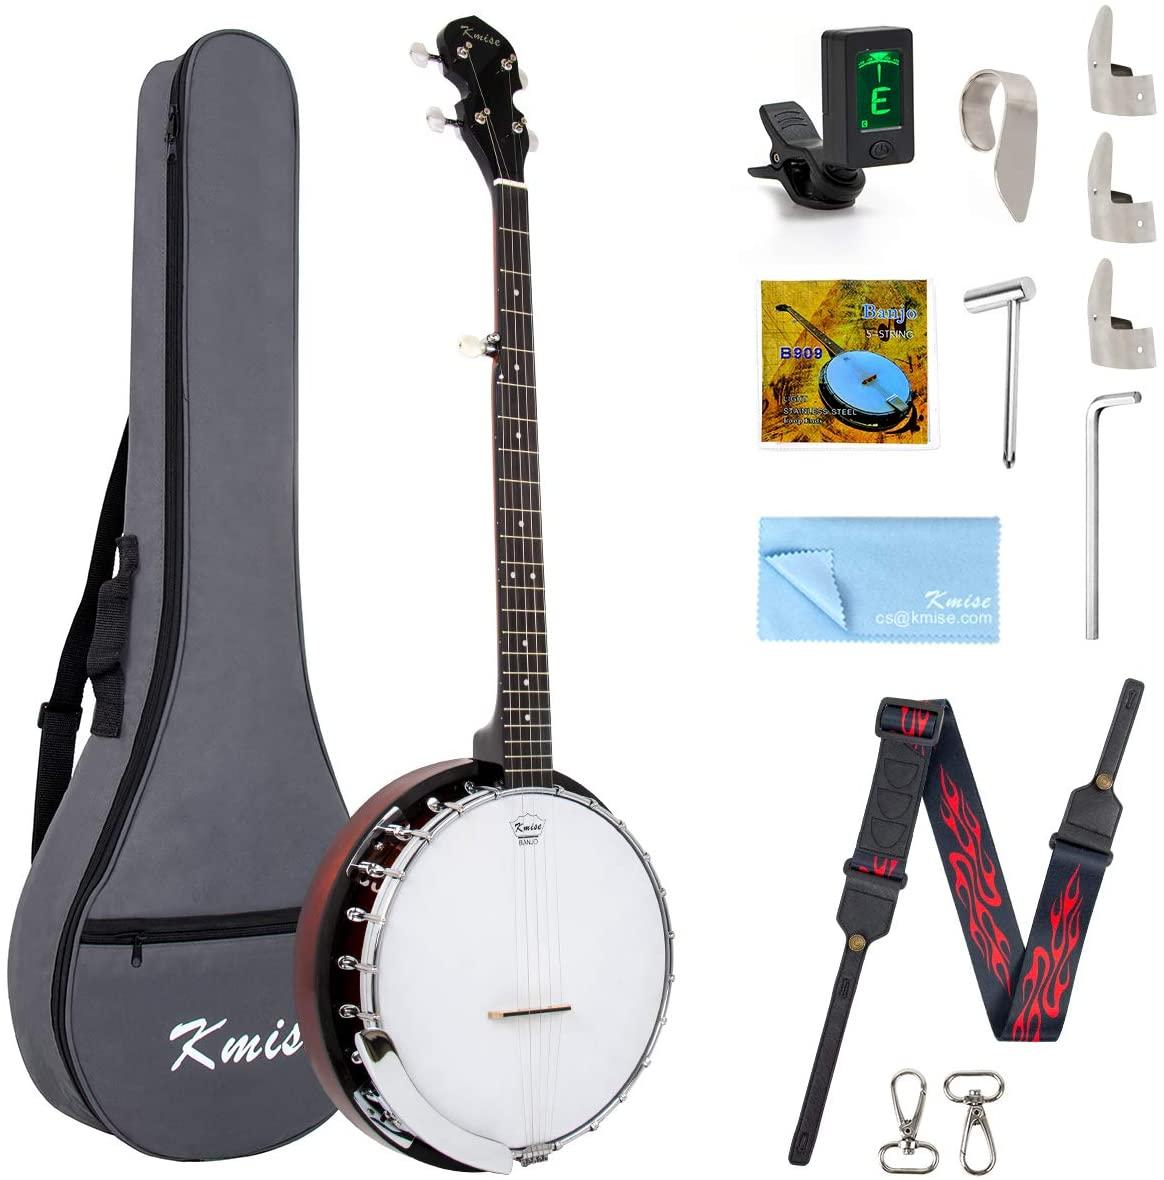 Kmise 5 String Banjo Remo Head Closed Sapele Back With Bag Tuner Strap Strings Pickup Picks Ruler Wrench Bridge